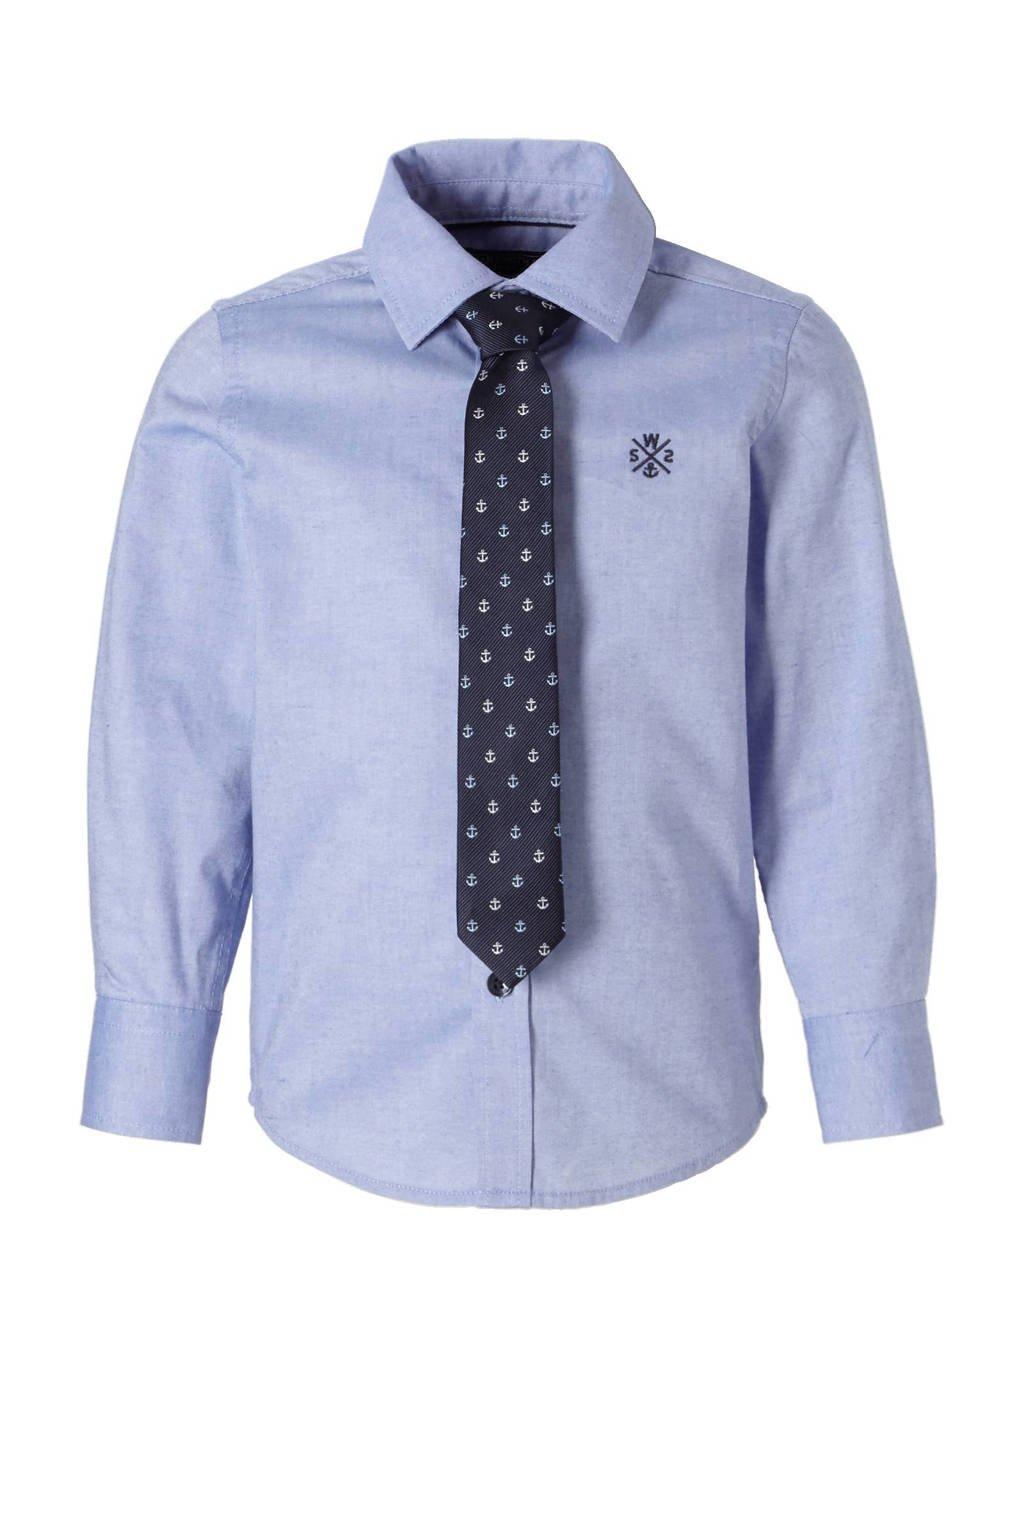 Ongekend C&A Palomino overhemd met stropdas   wehkamp QH-34